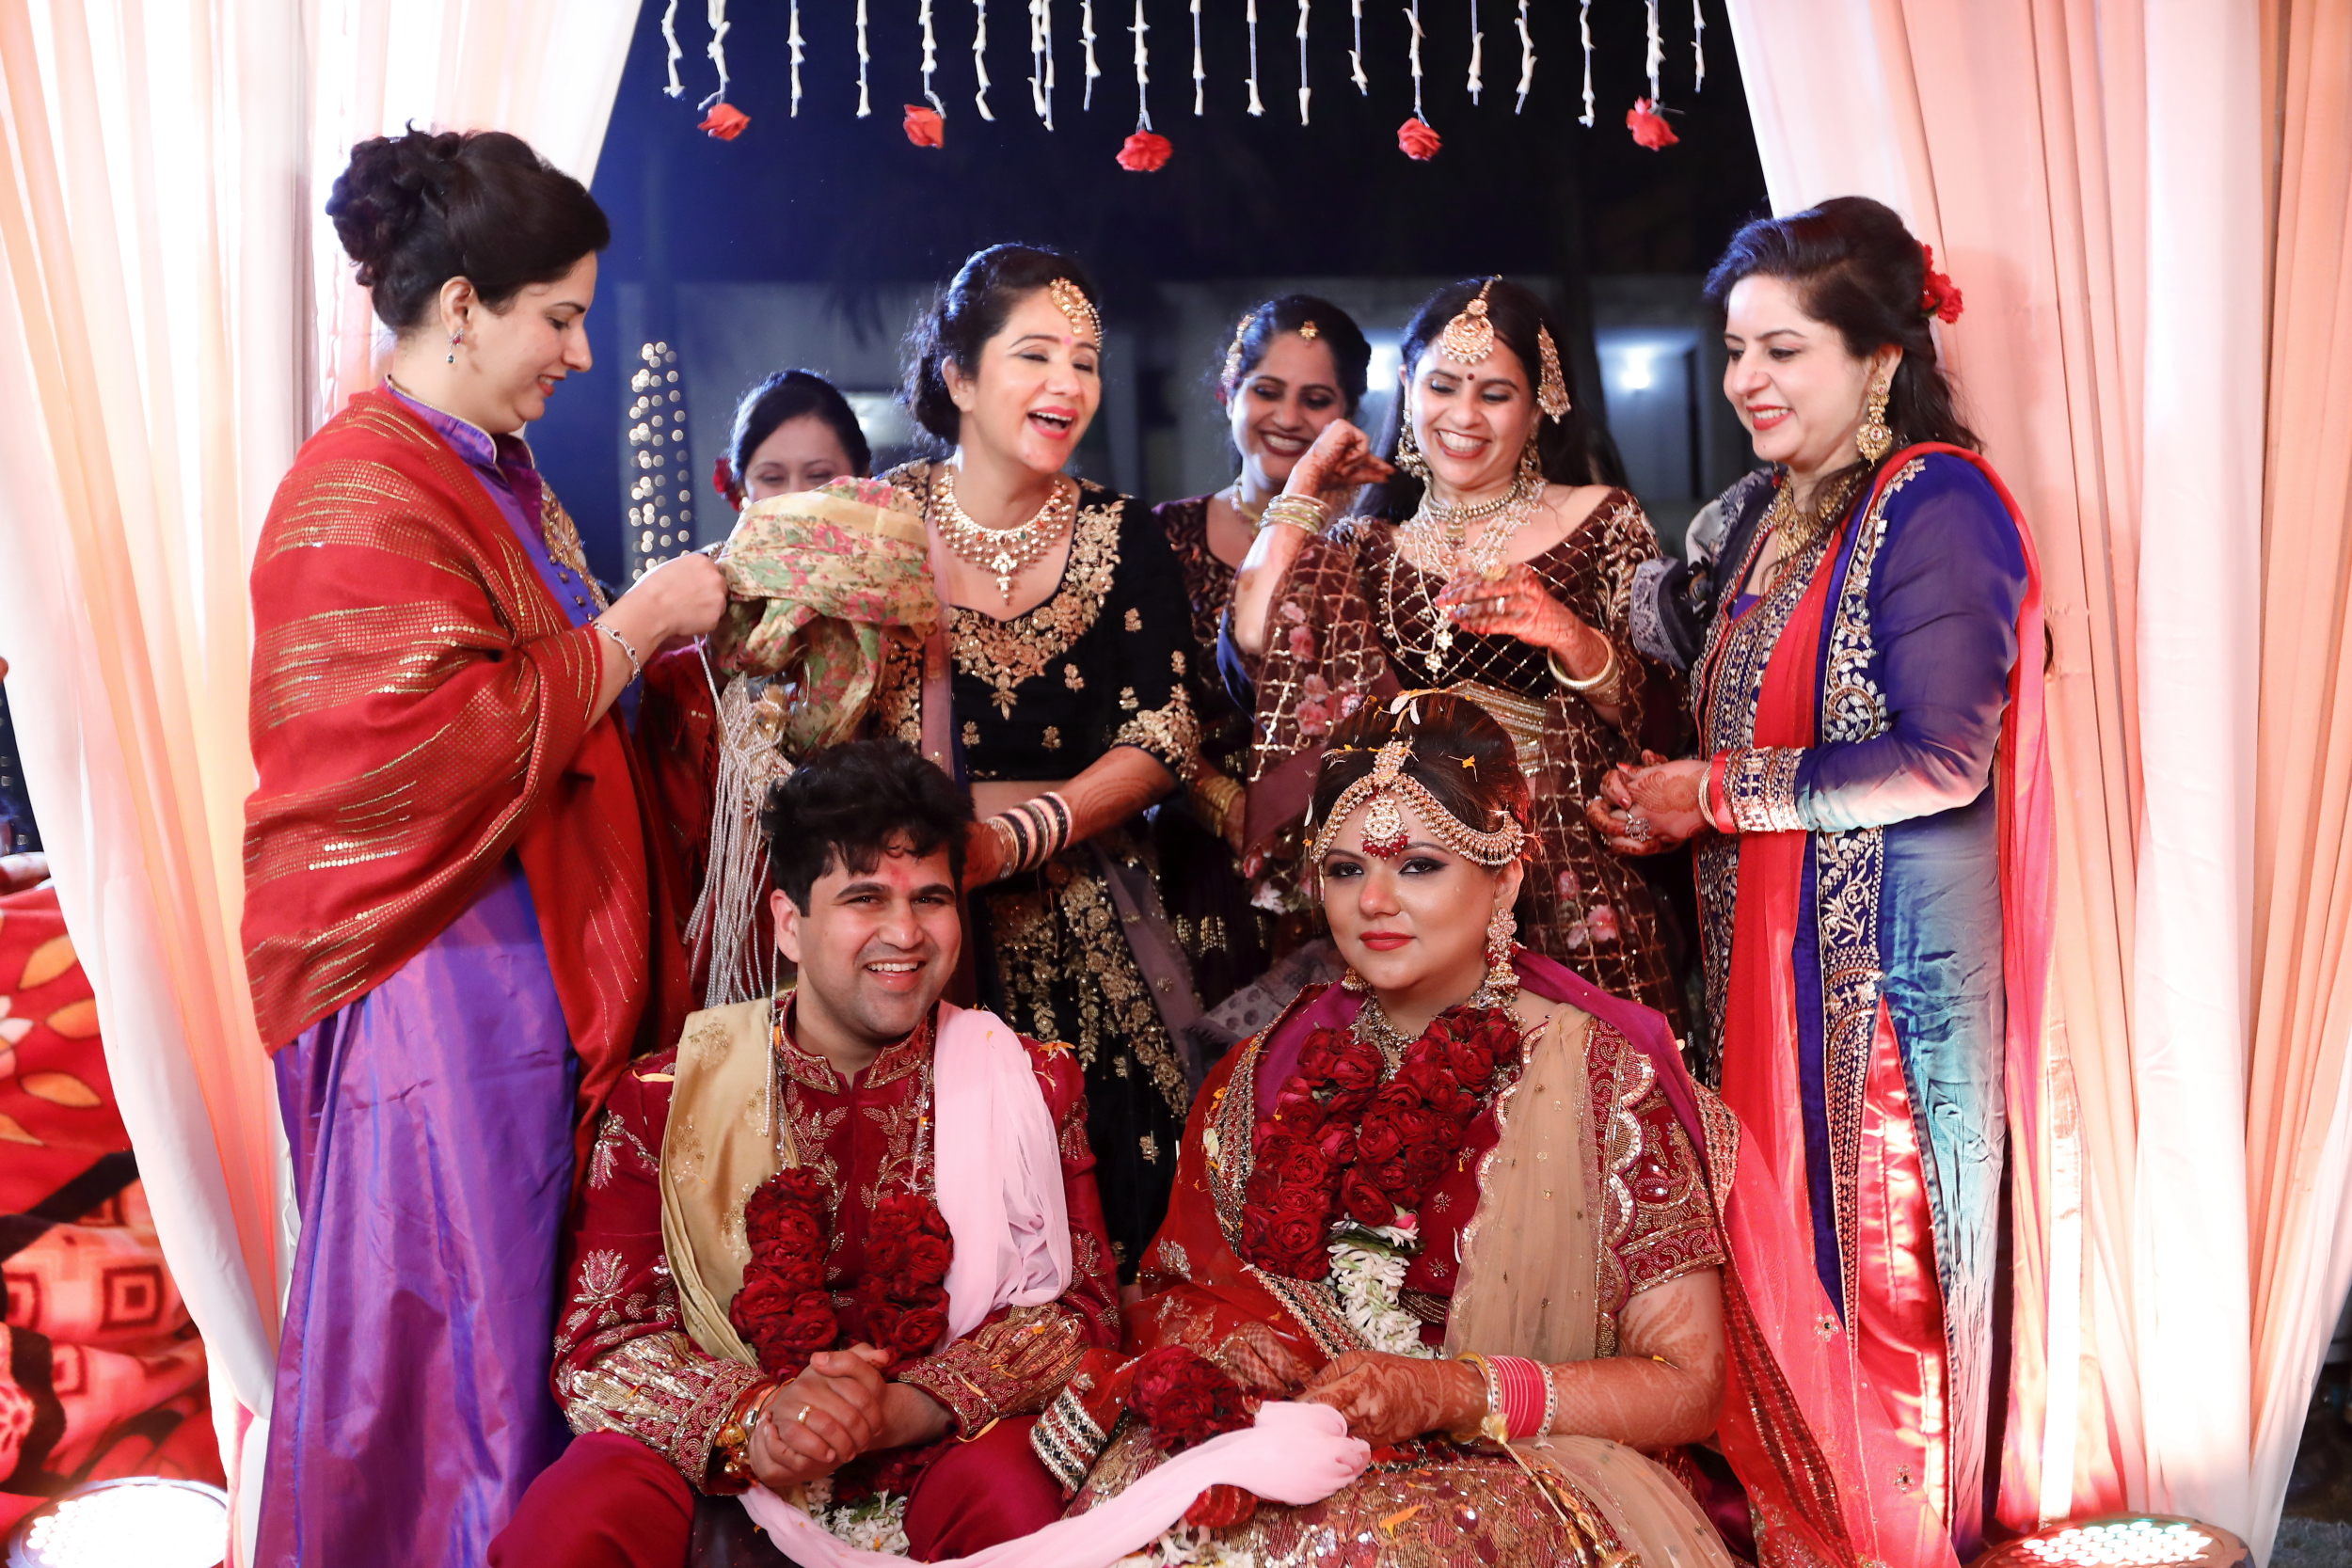 Candid wedding photographersC69A1330 Delhi